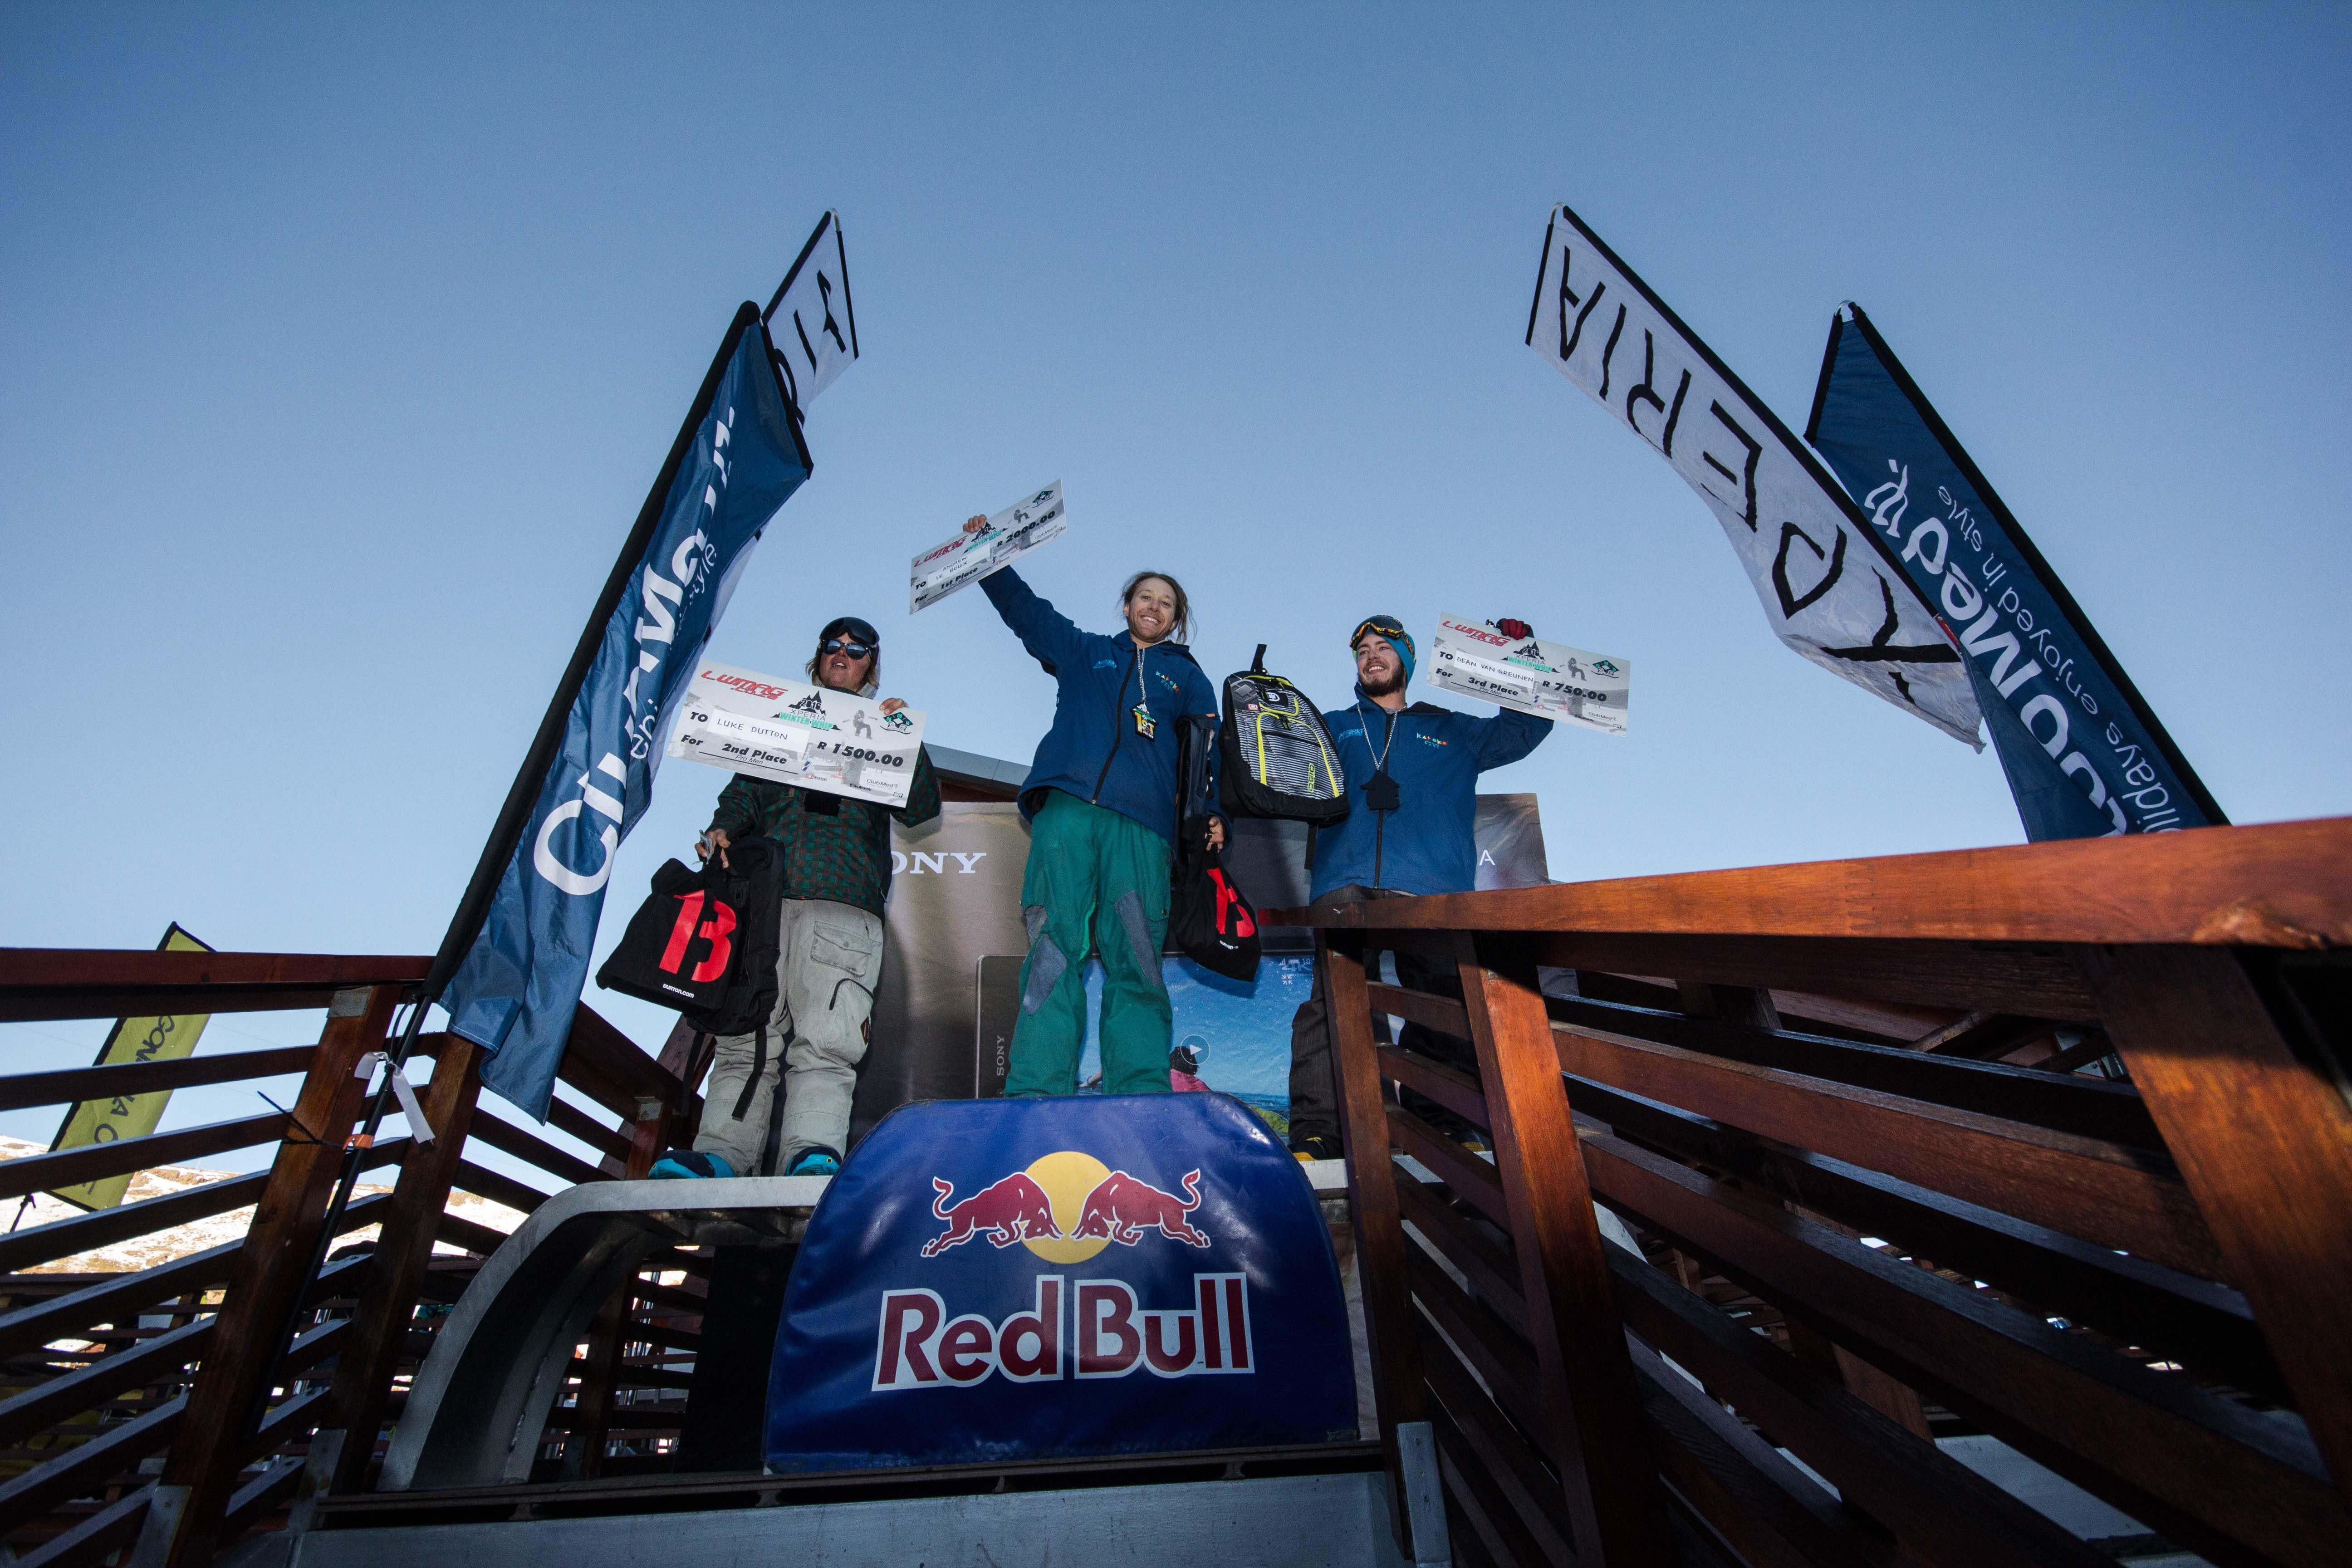 Pro Men podium at Xperia Winter Whip 2016